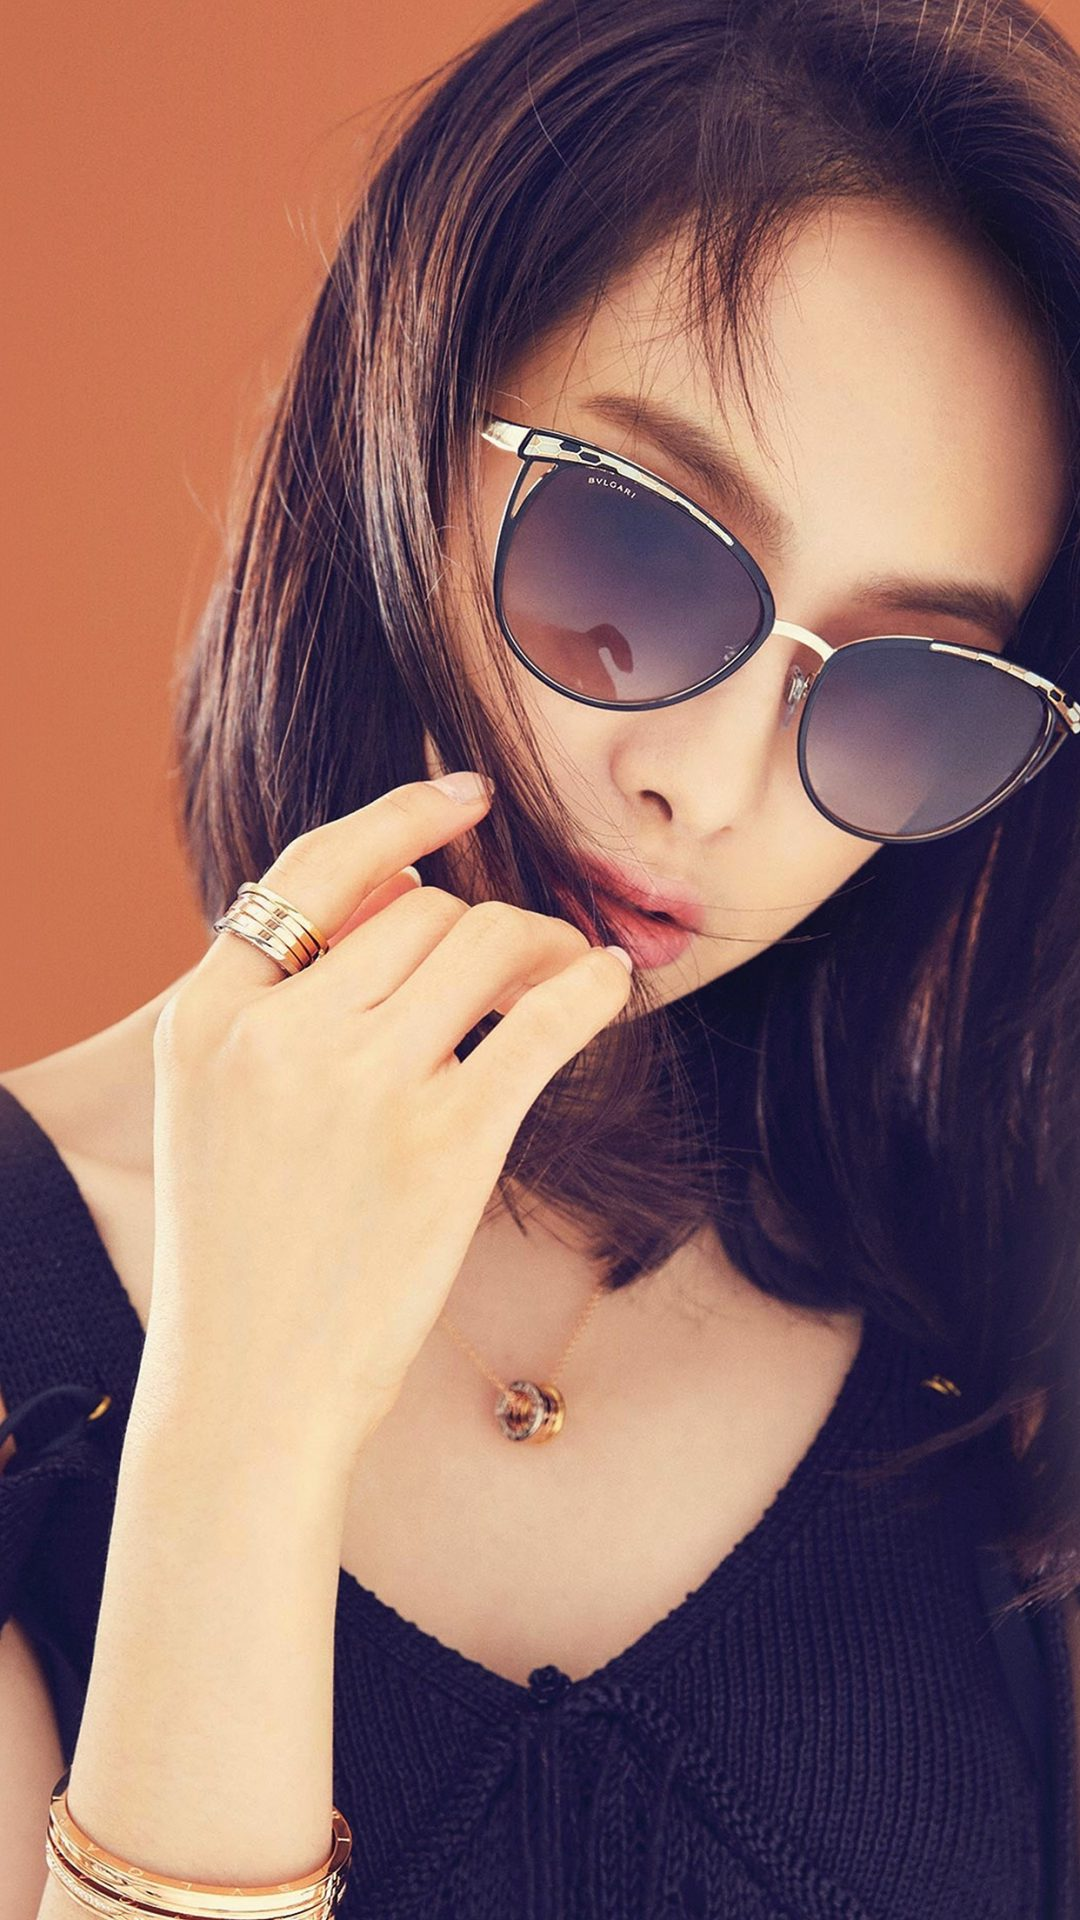 Victoria Kpop Girl Sunglass Beauty